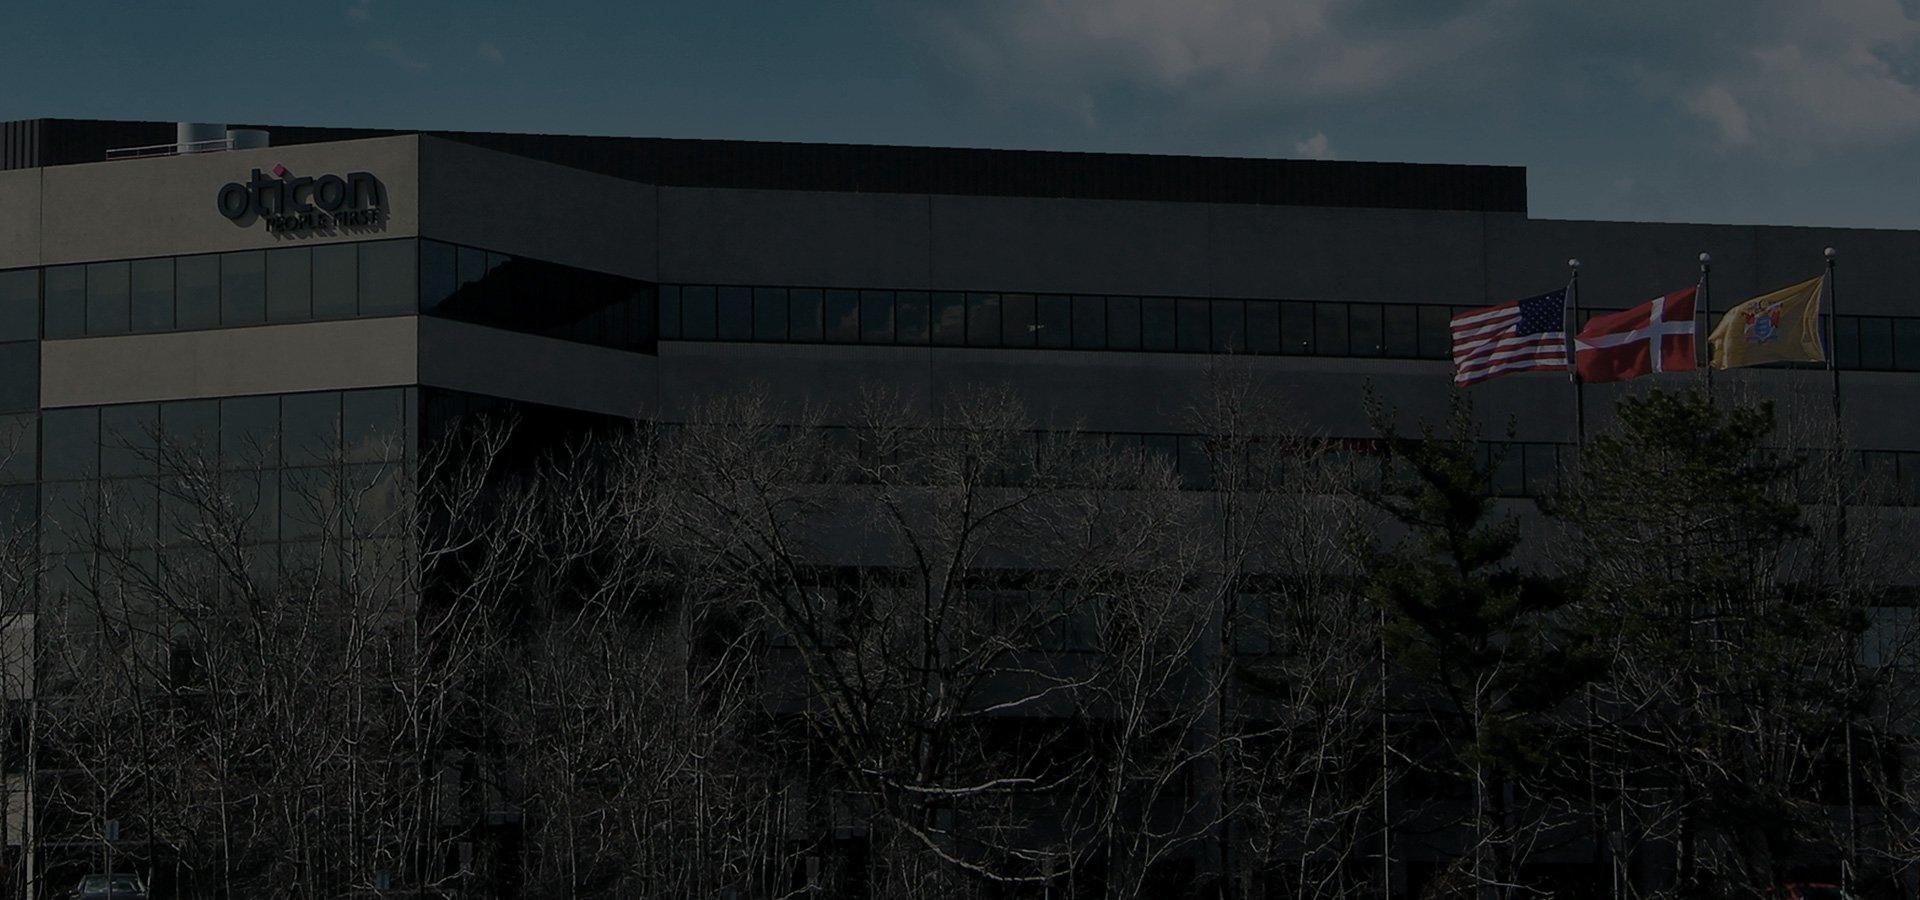 introbanner-USHeadquarters-TopBanner-1920x900